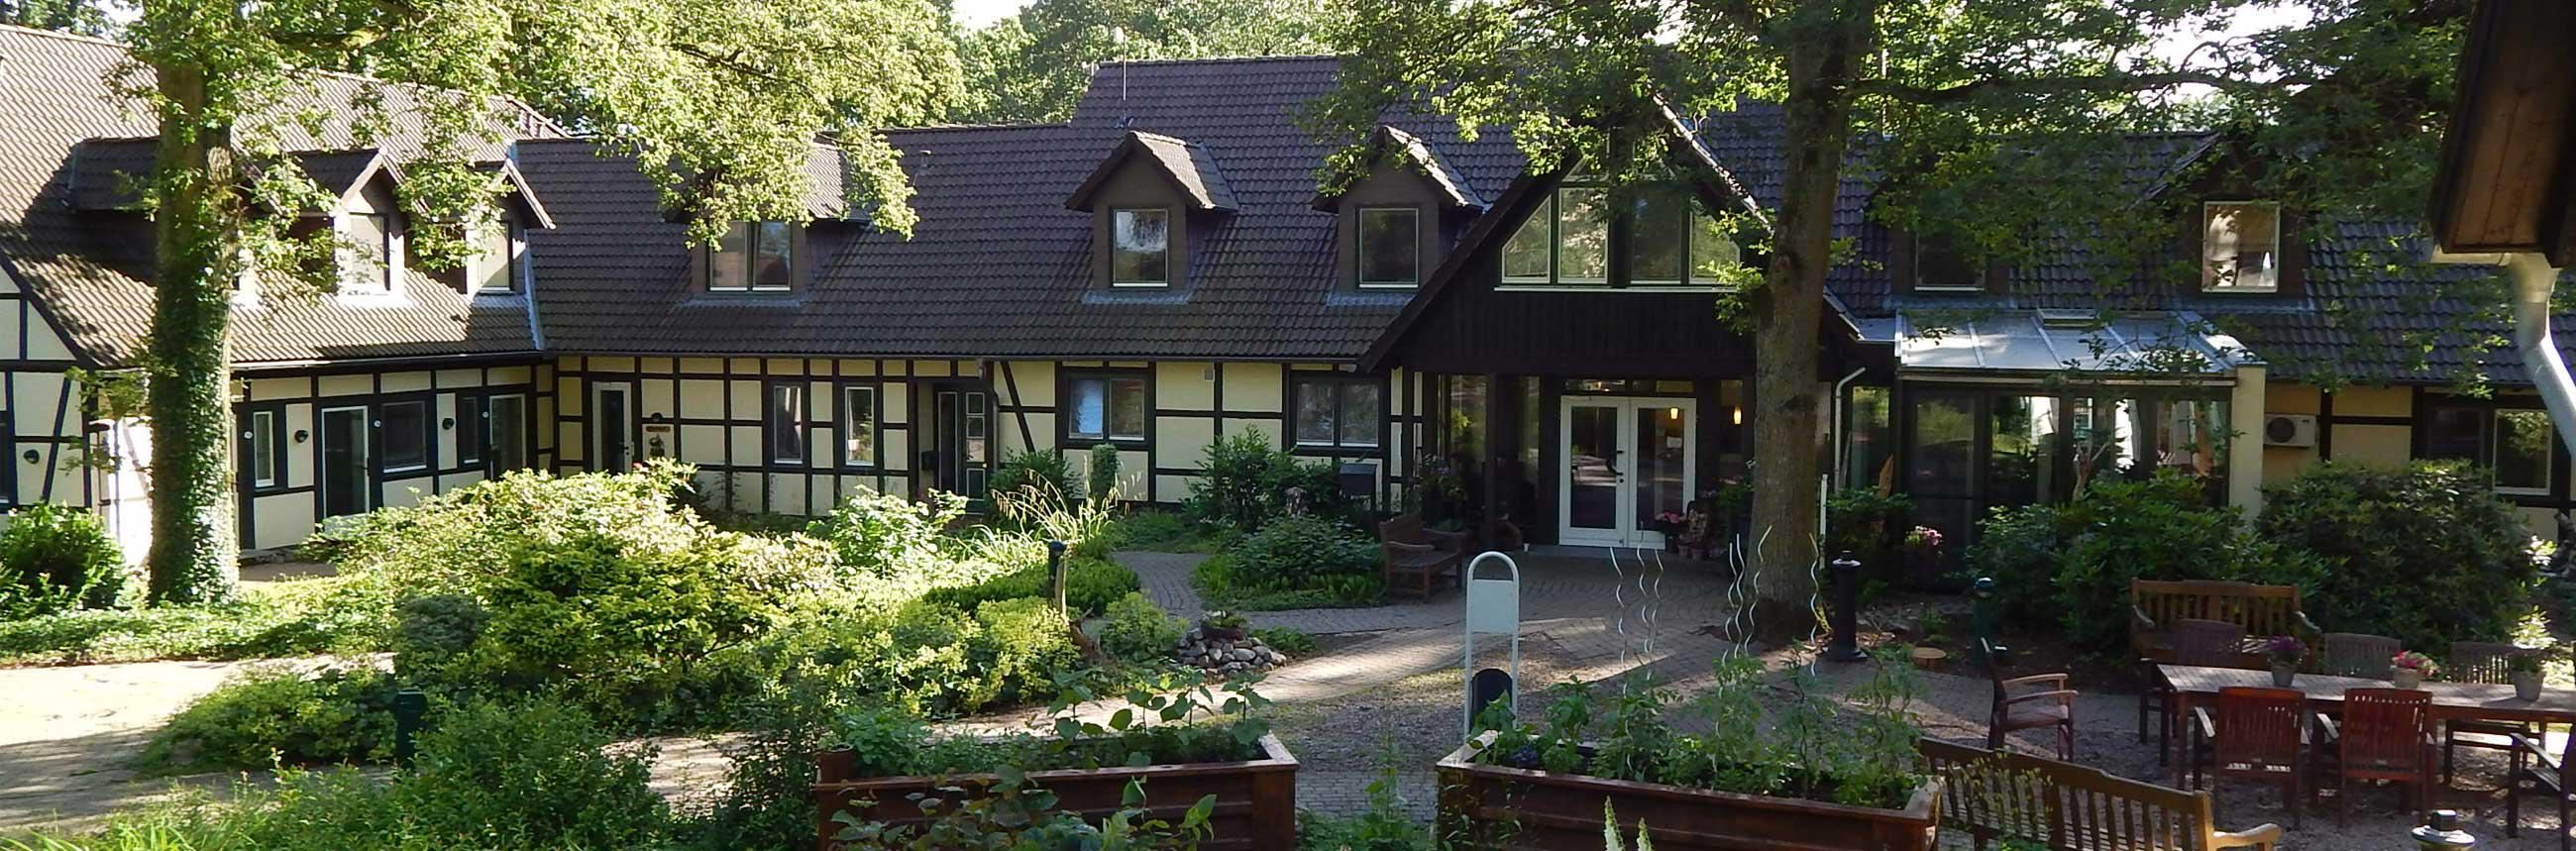 Ellernhof - Willkommen